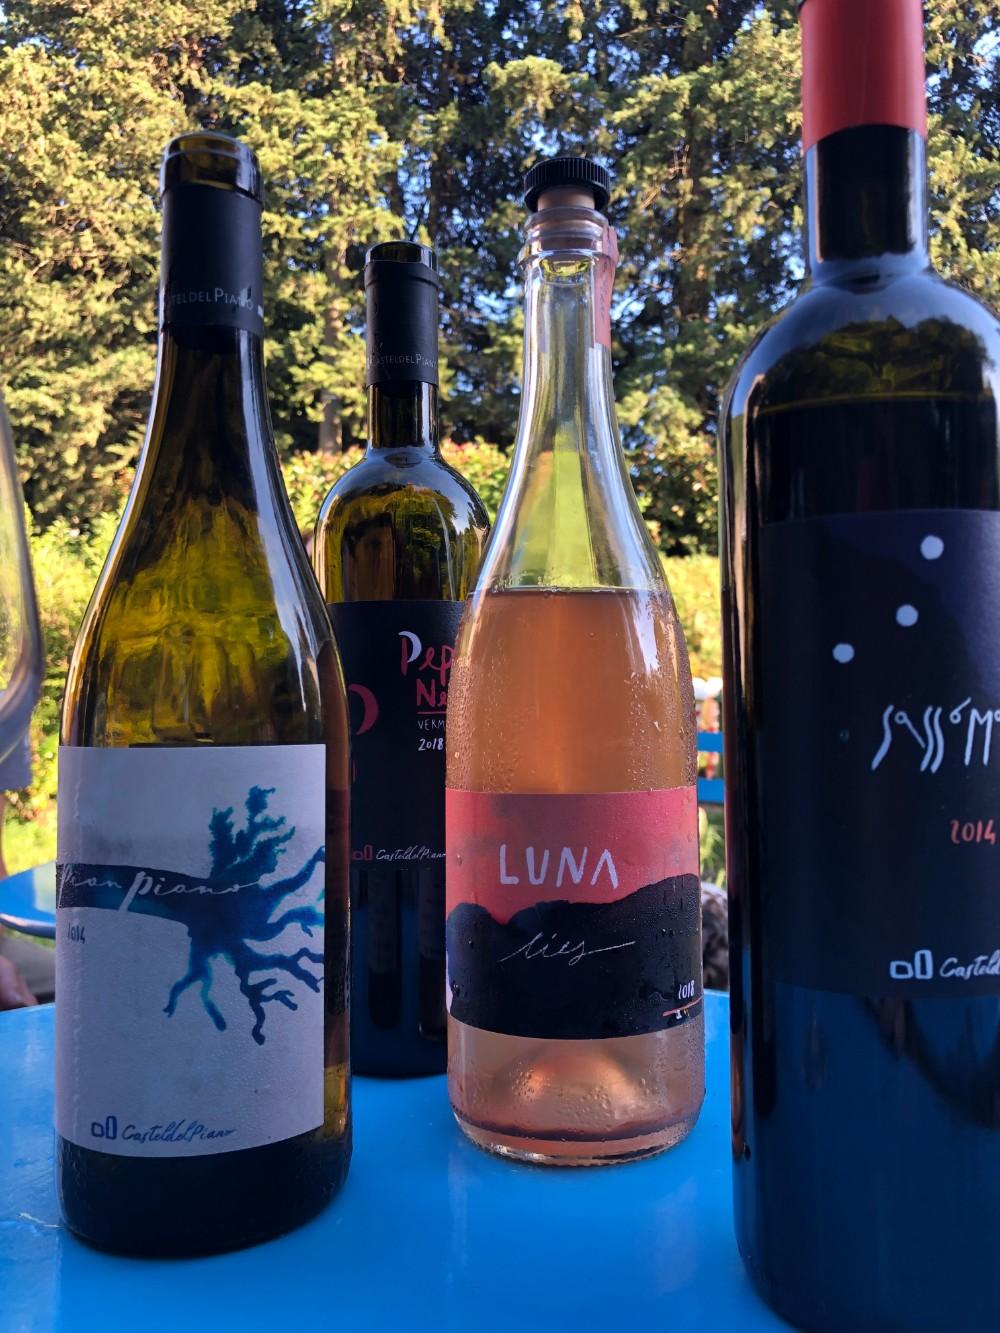 A range of very good wine